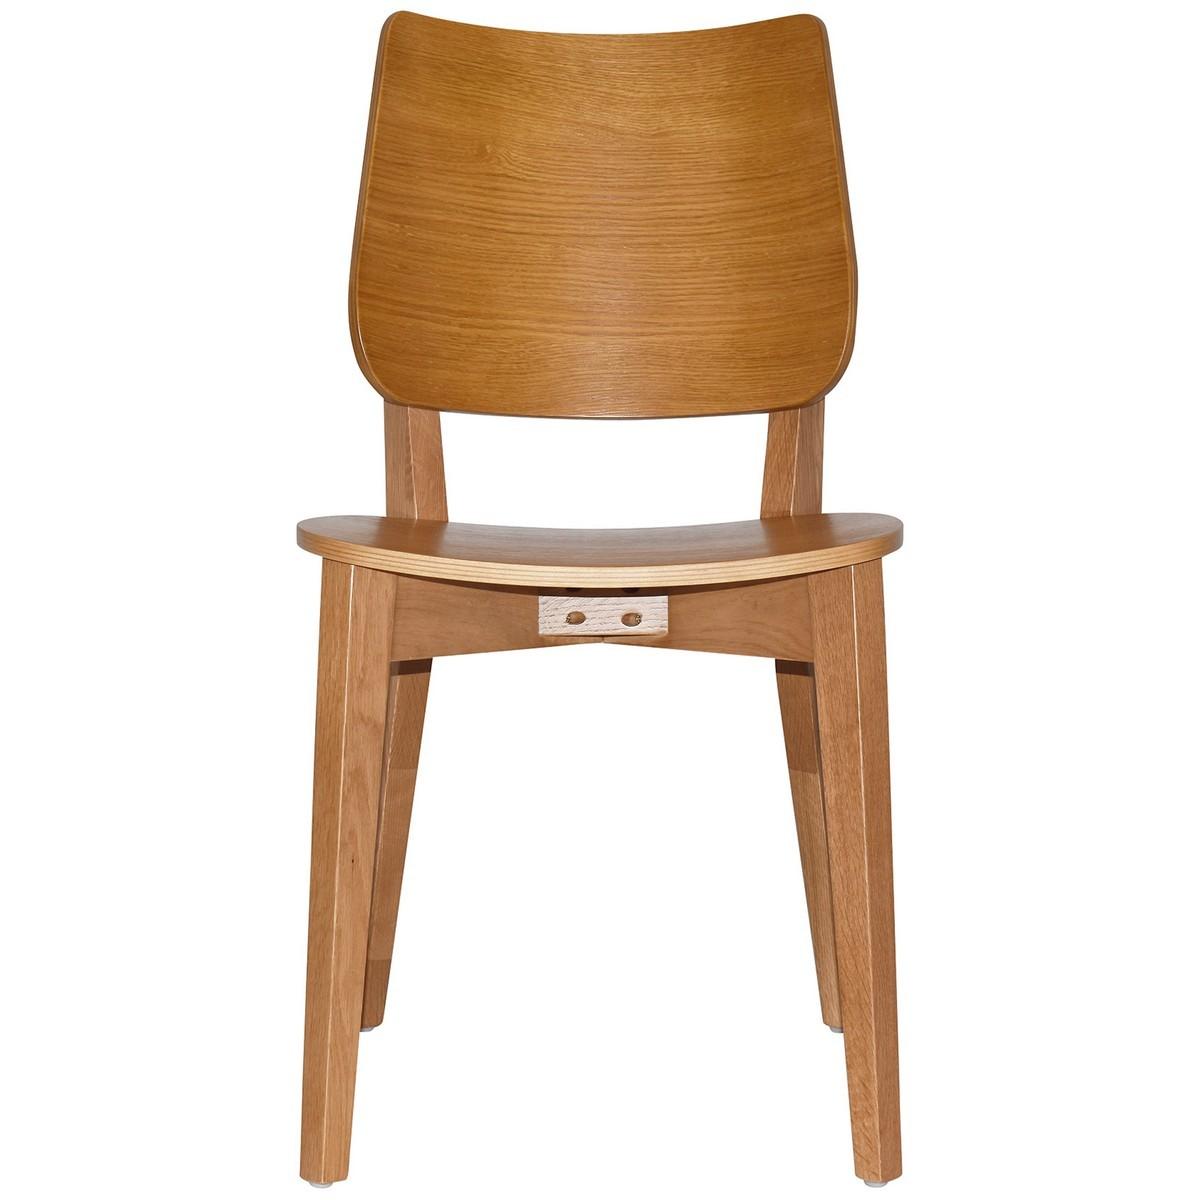 Dakota Commercial Grade Oak Timber Dining Chair, Timber Seat, Light Oak